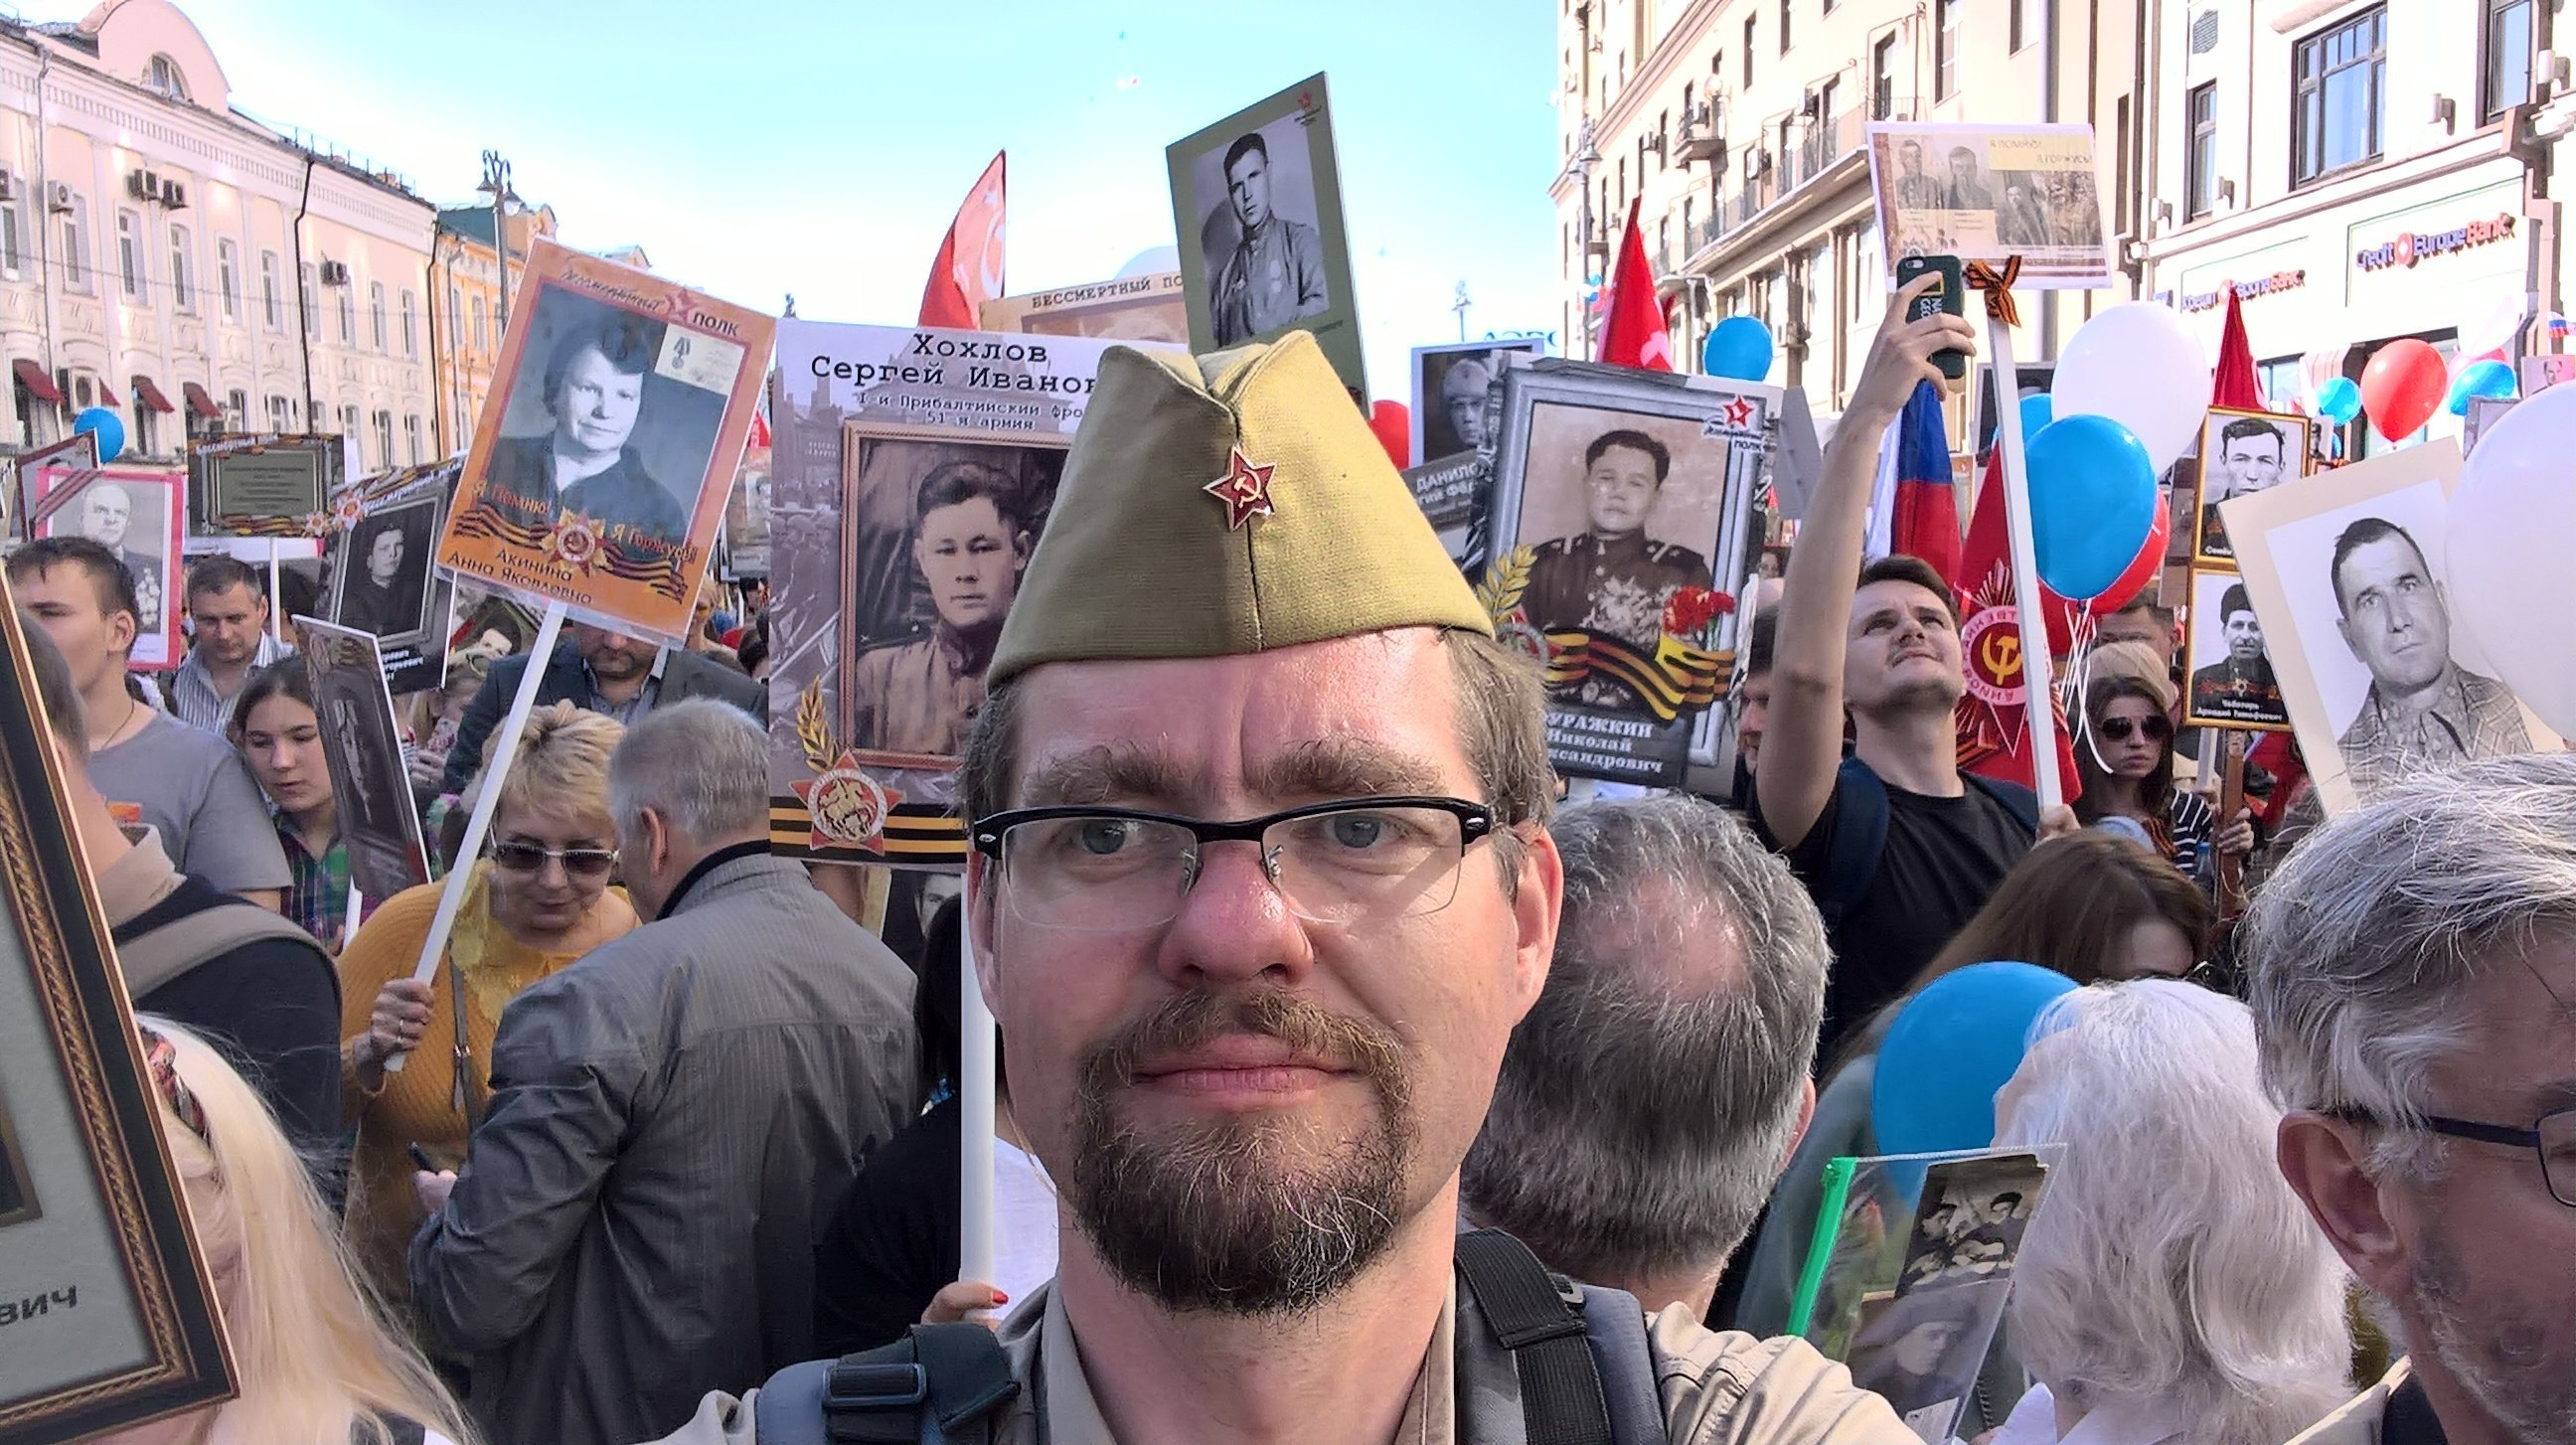 Krzysztof Podgórski, polski publicysta